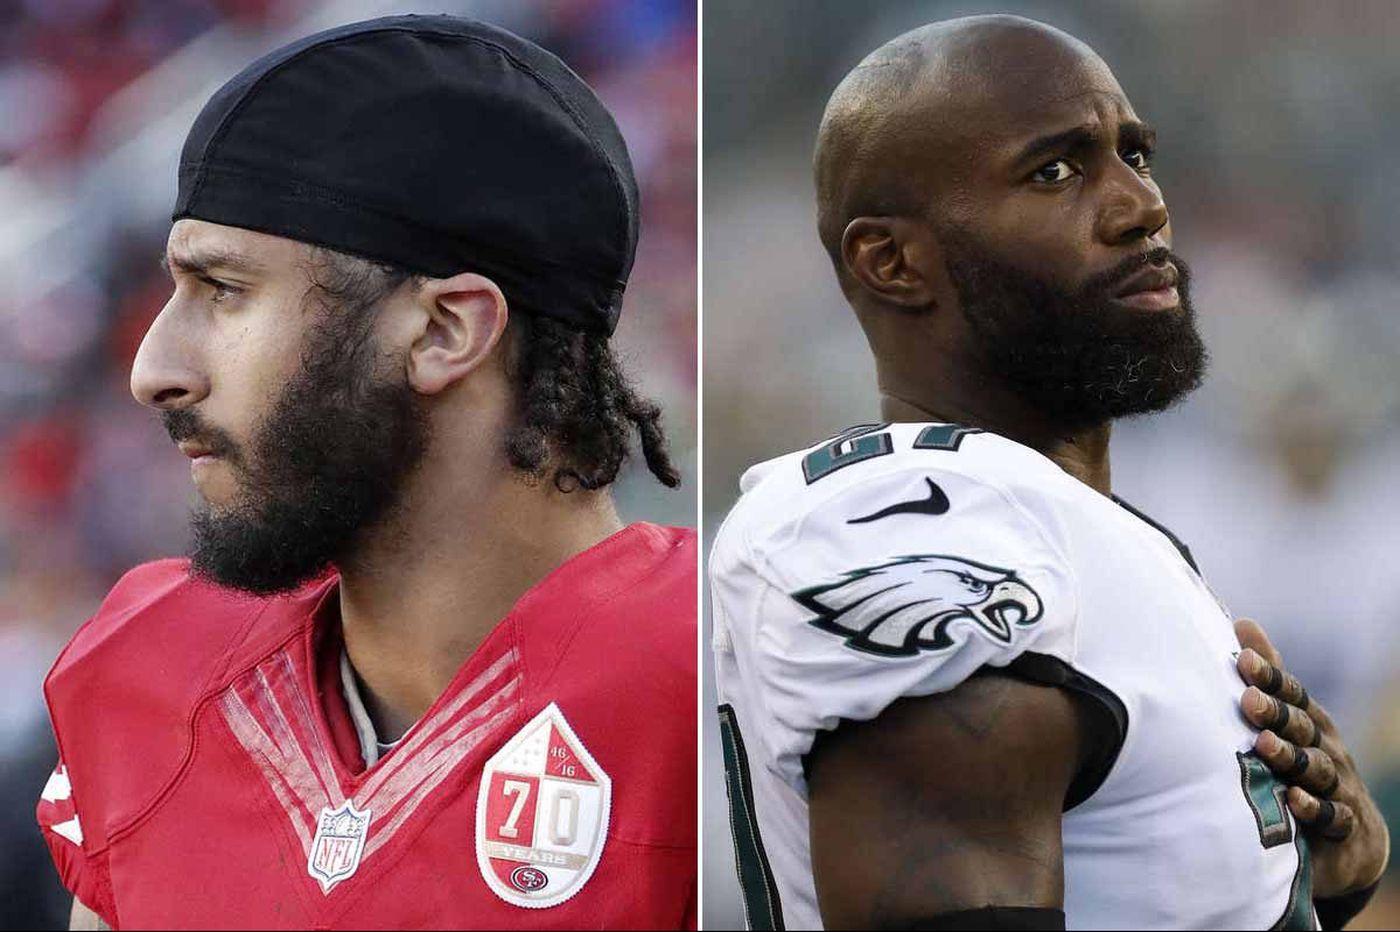 Eagles captain Malcolm Jenkins skeptical of NFL's motives regarding Colin Kaepernick's workout | Marcus Hayes